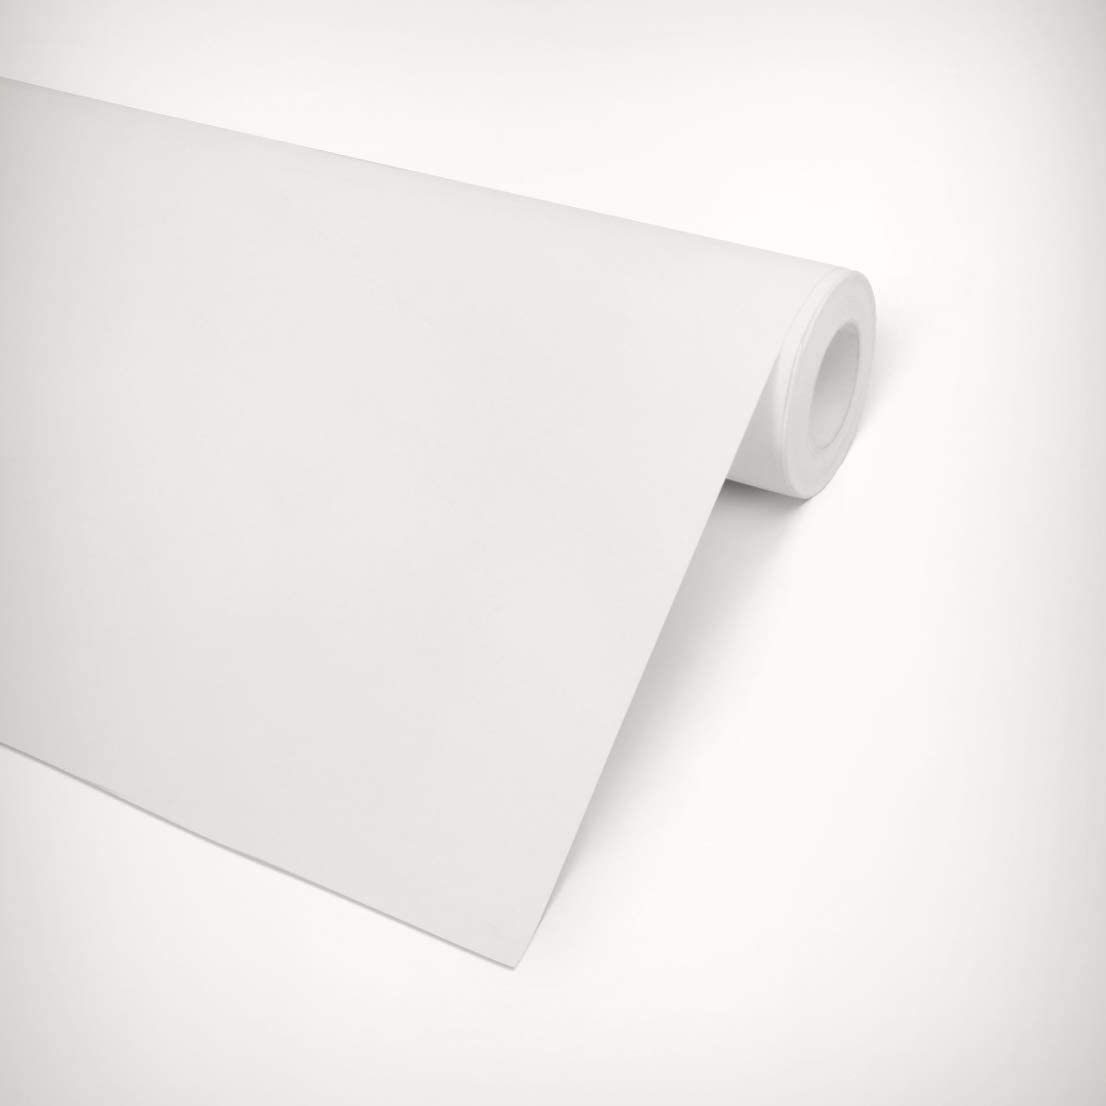 Pantalla para lámpara de PVC Material autoadhesivo 40 meter de ...